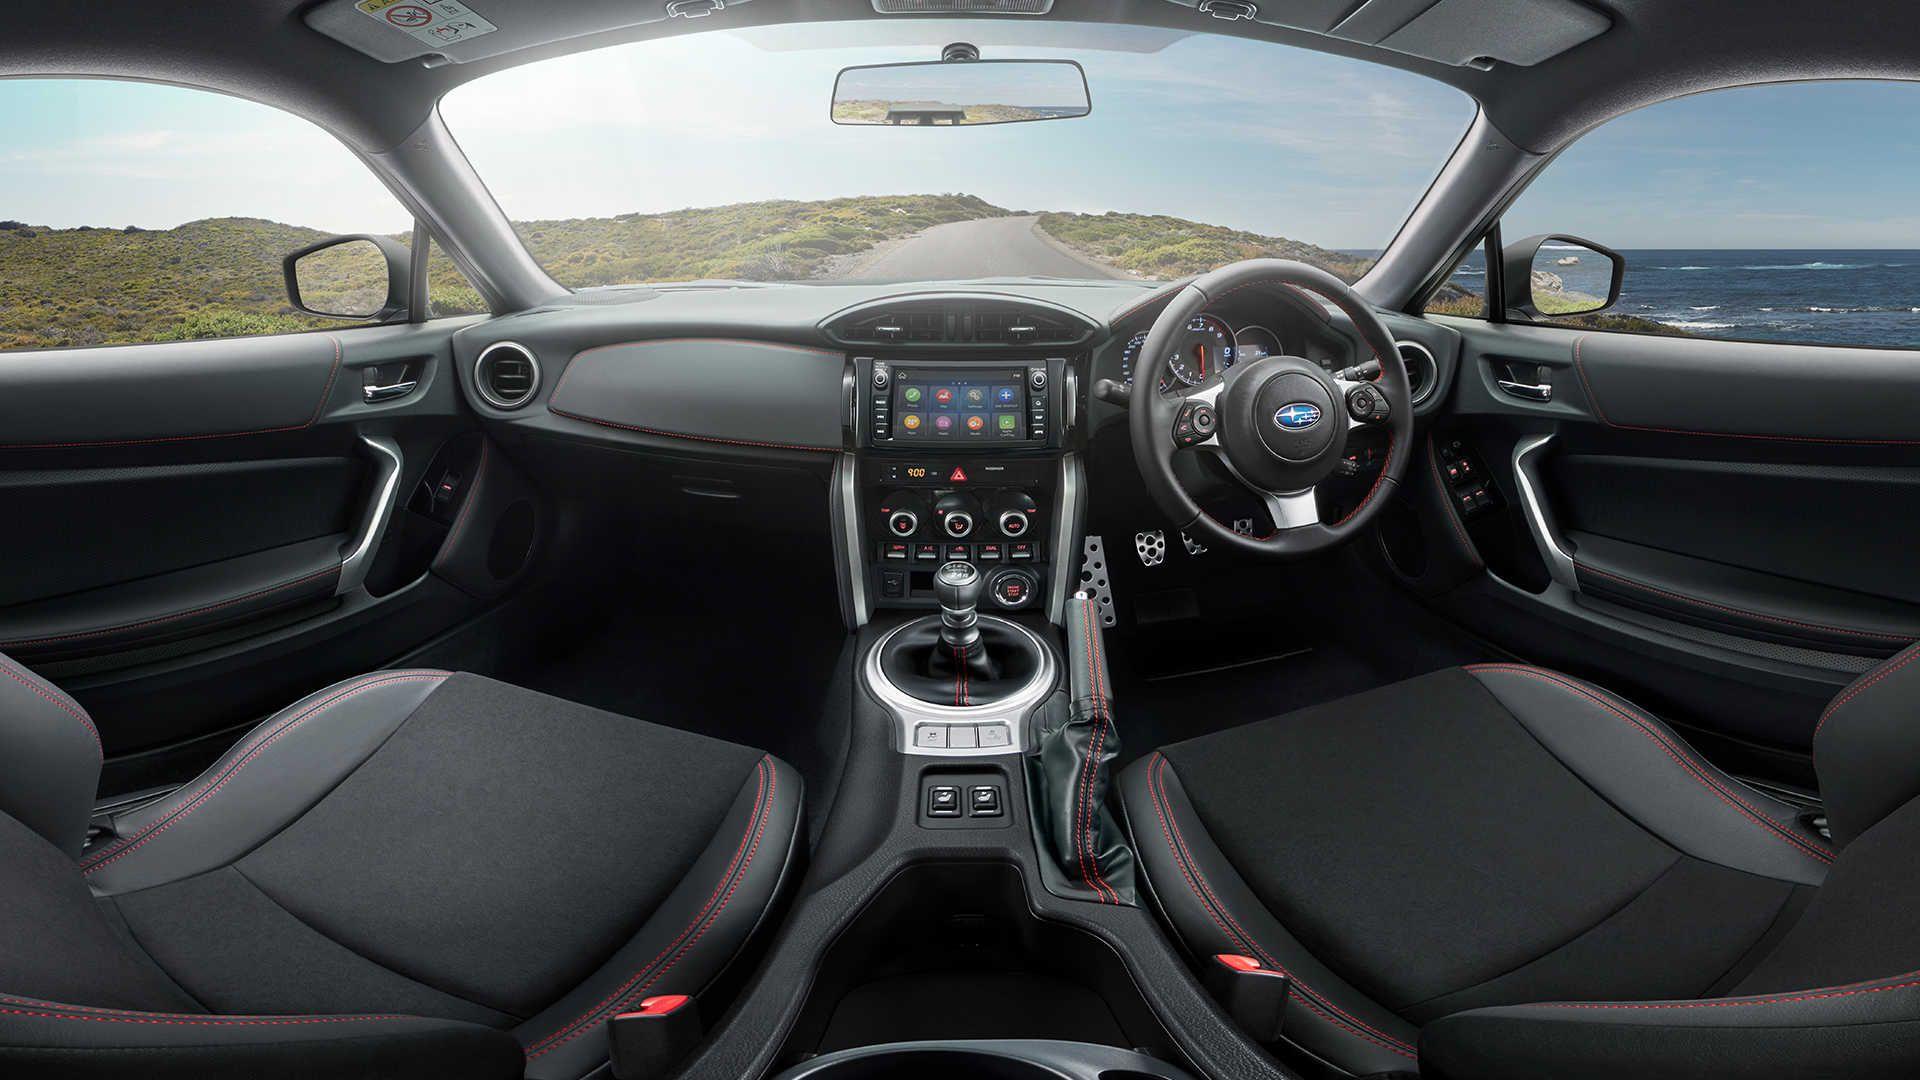 Subaru Brz Interior in 2020 Subaru brz interior, Subaru